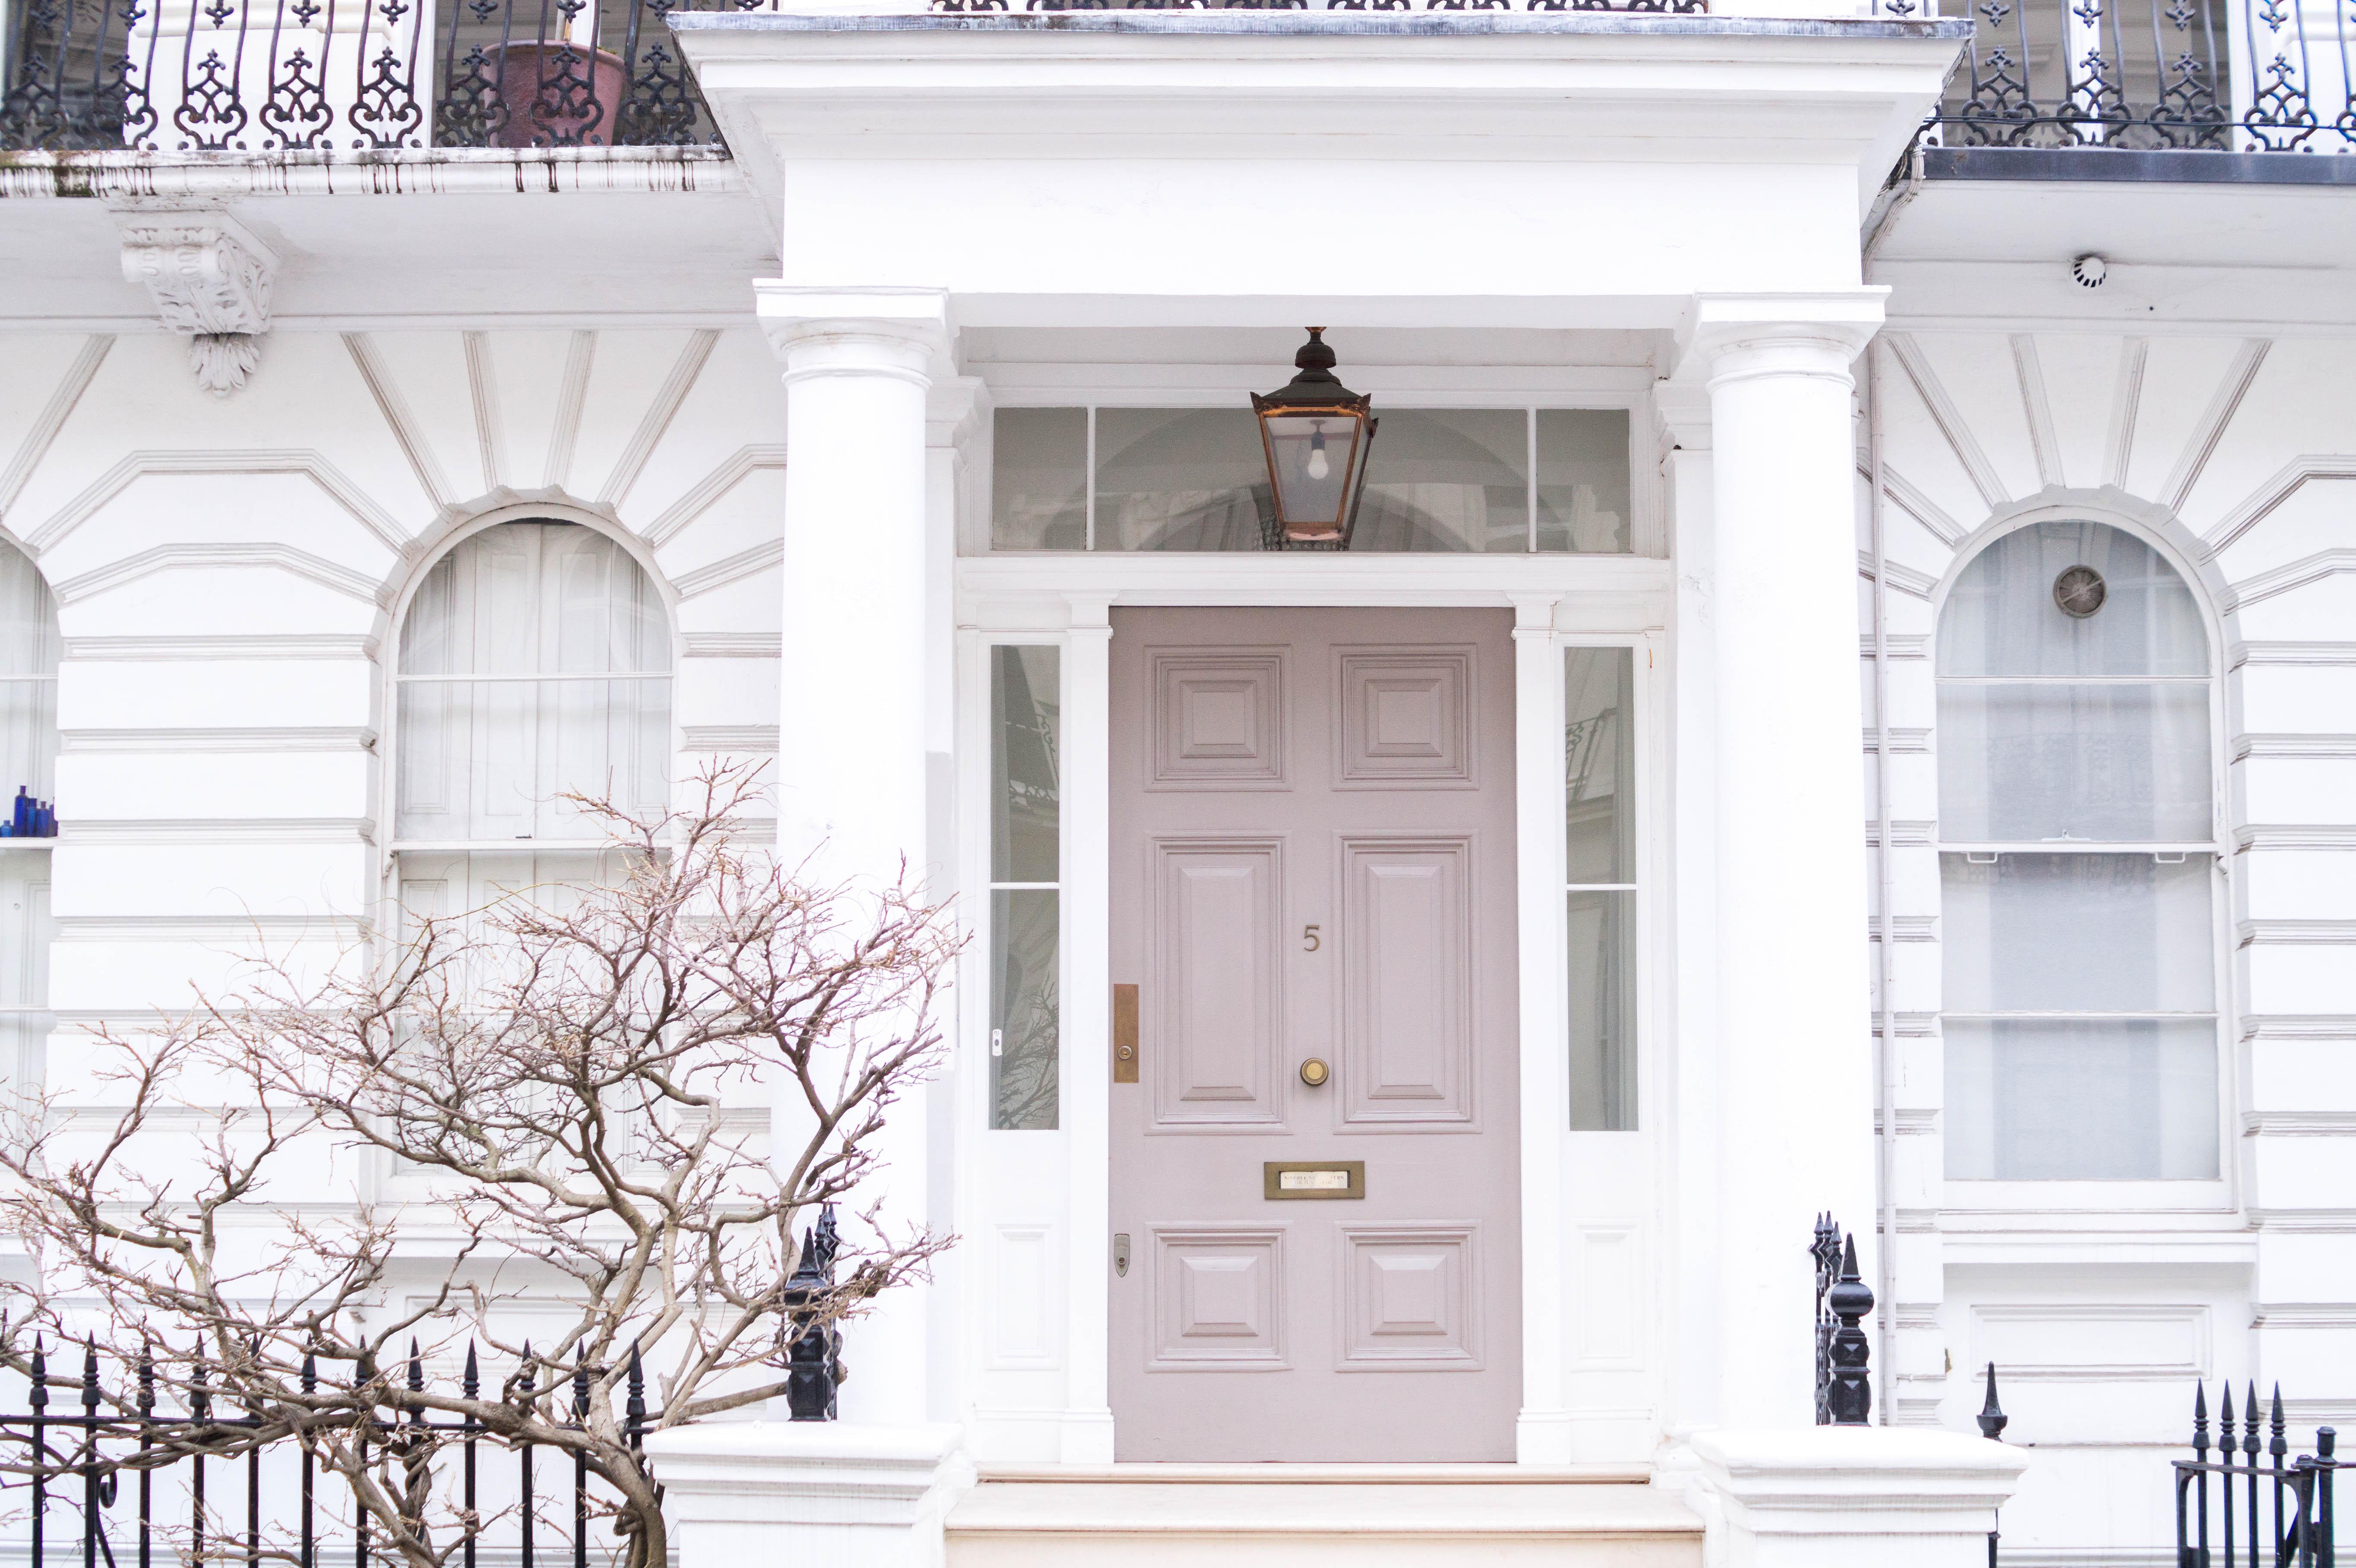 london notting hill kensington door